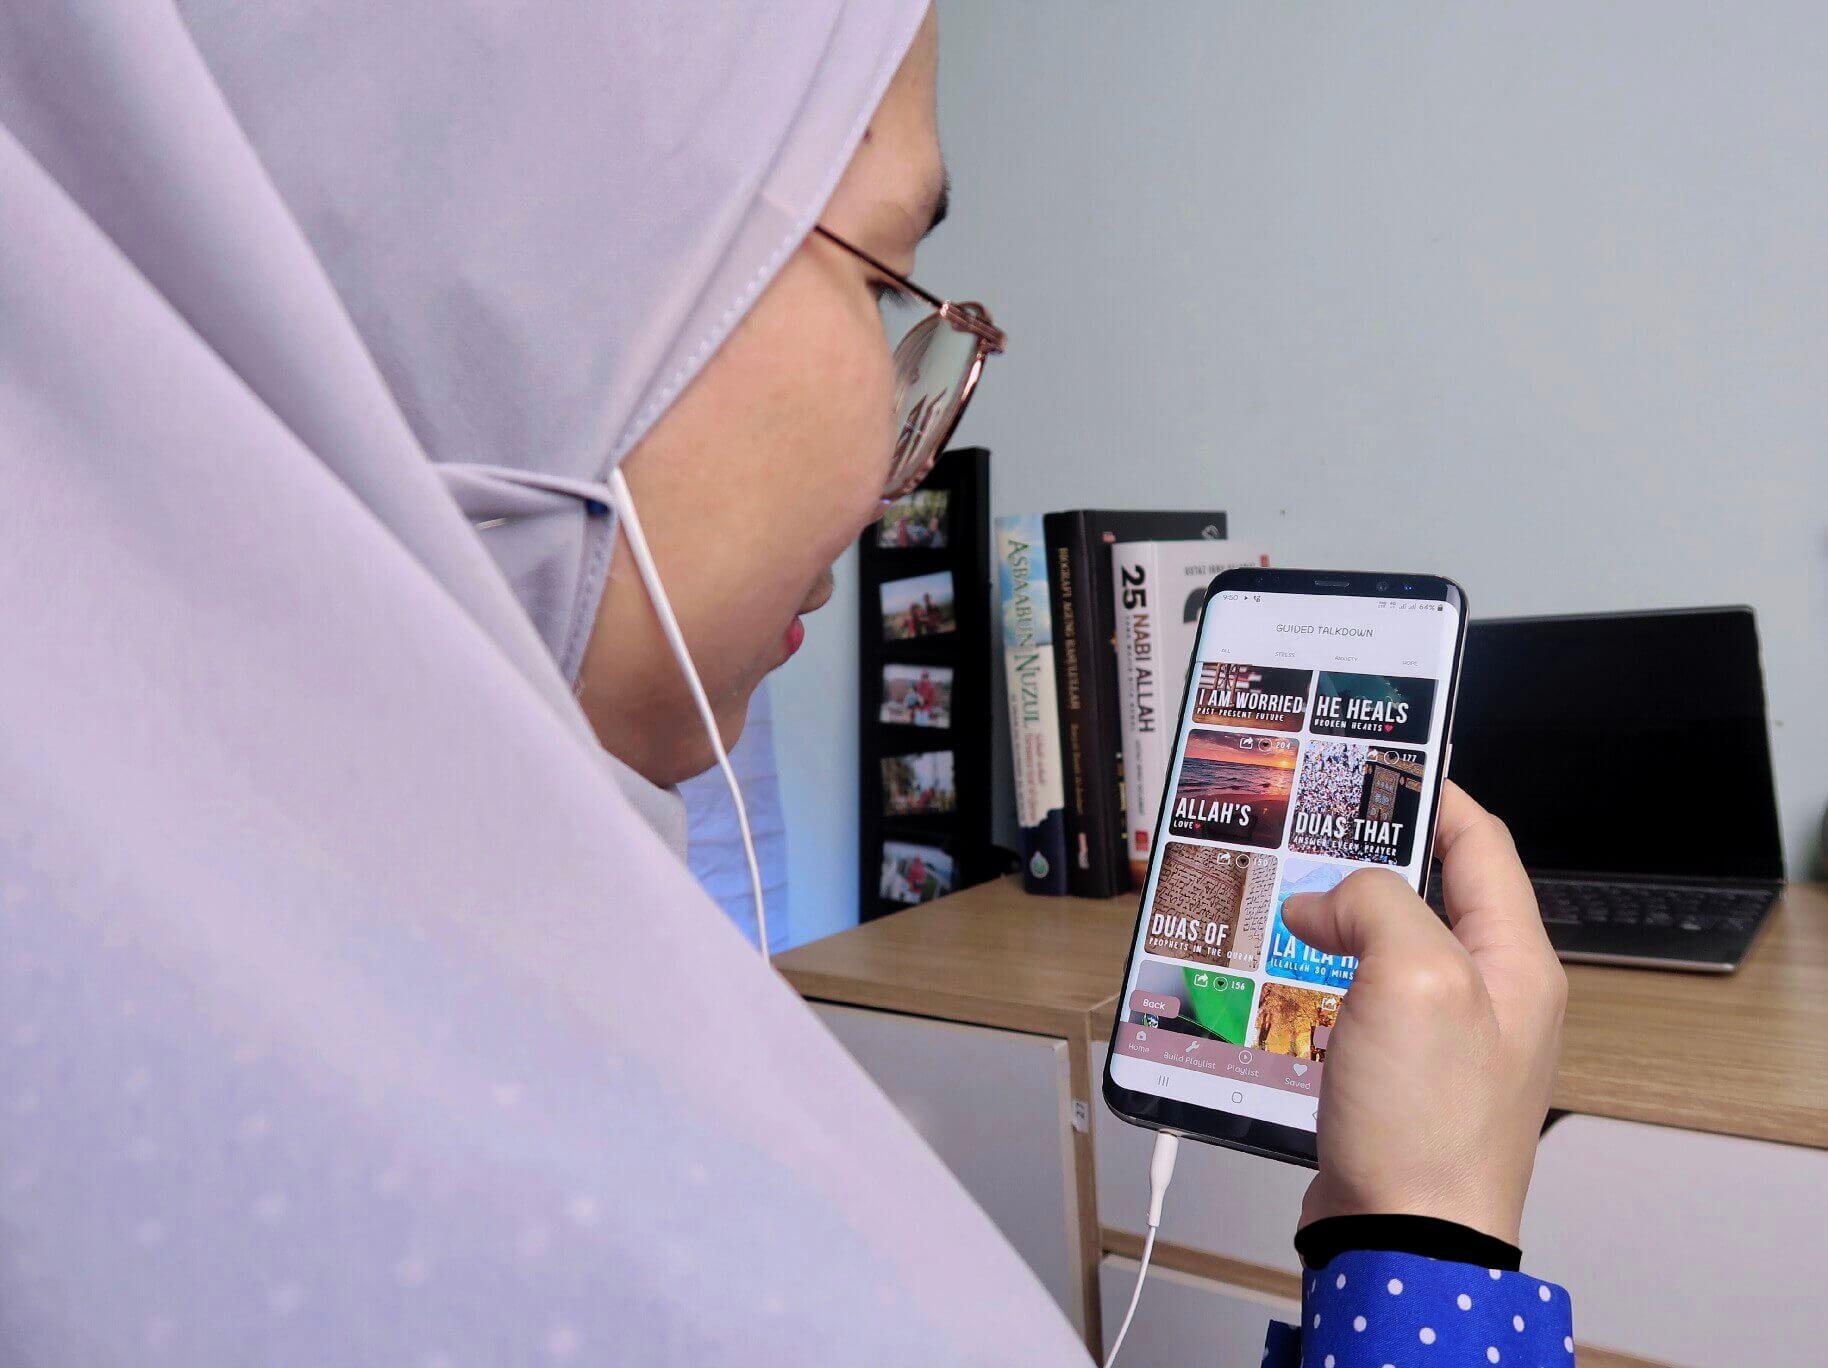 Kawal Tekanan, Keresahan dan Depresi Dengan Terapi Jiwa Aplikasi Mindful Muslim